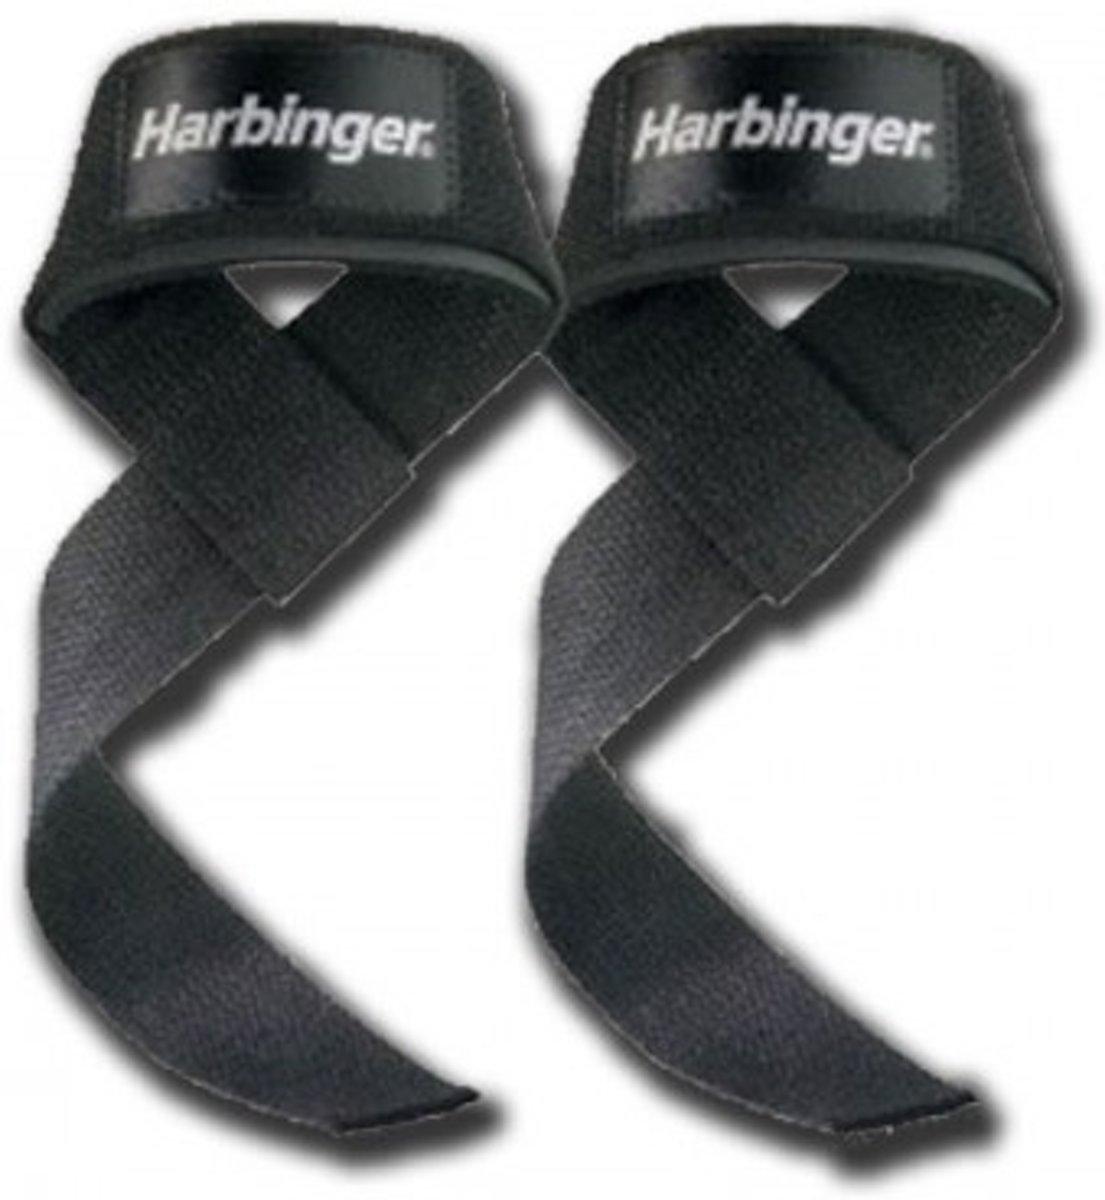 Harbinger BIG GRIP Padded Lifting Straps kopen